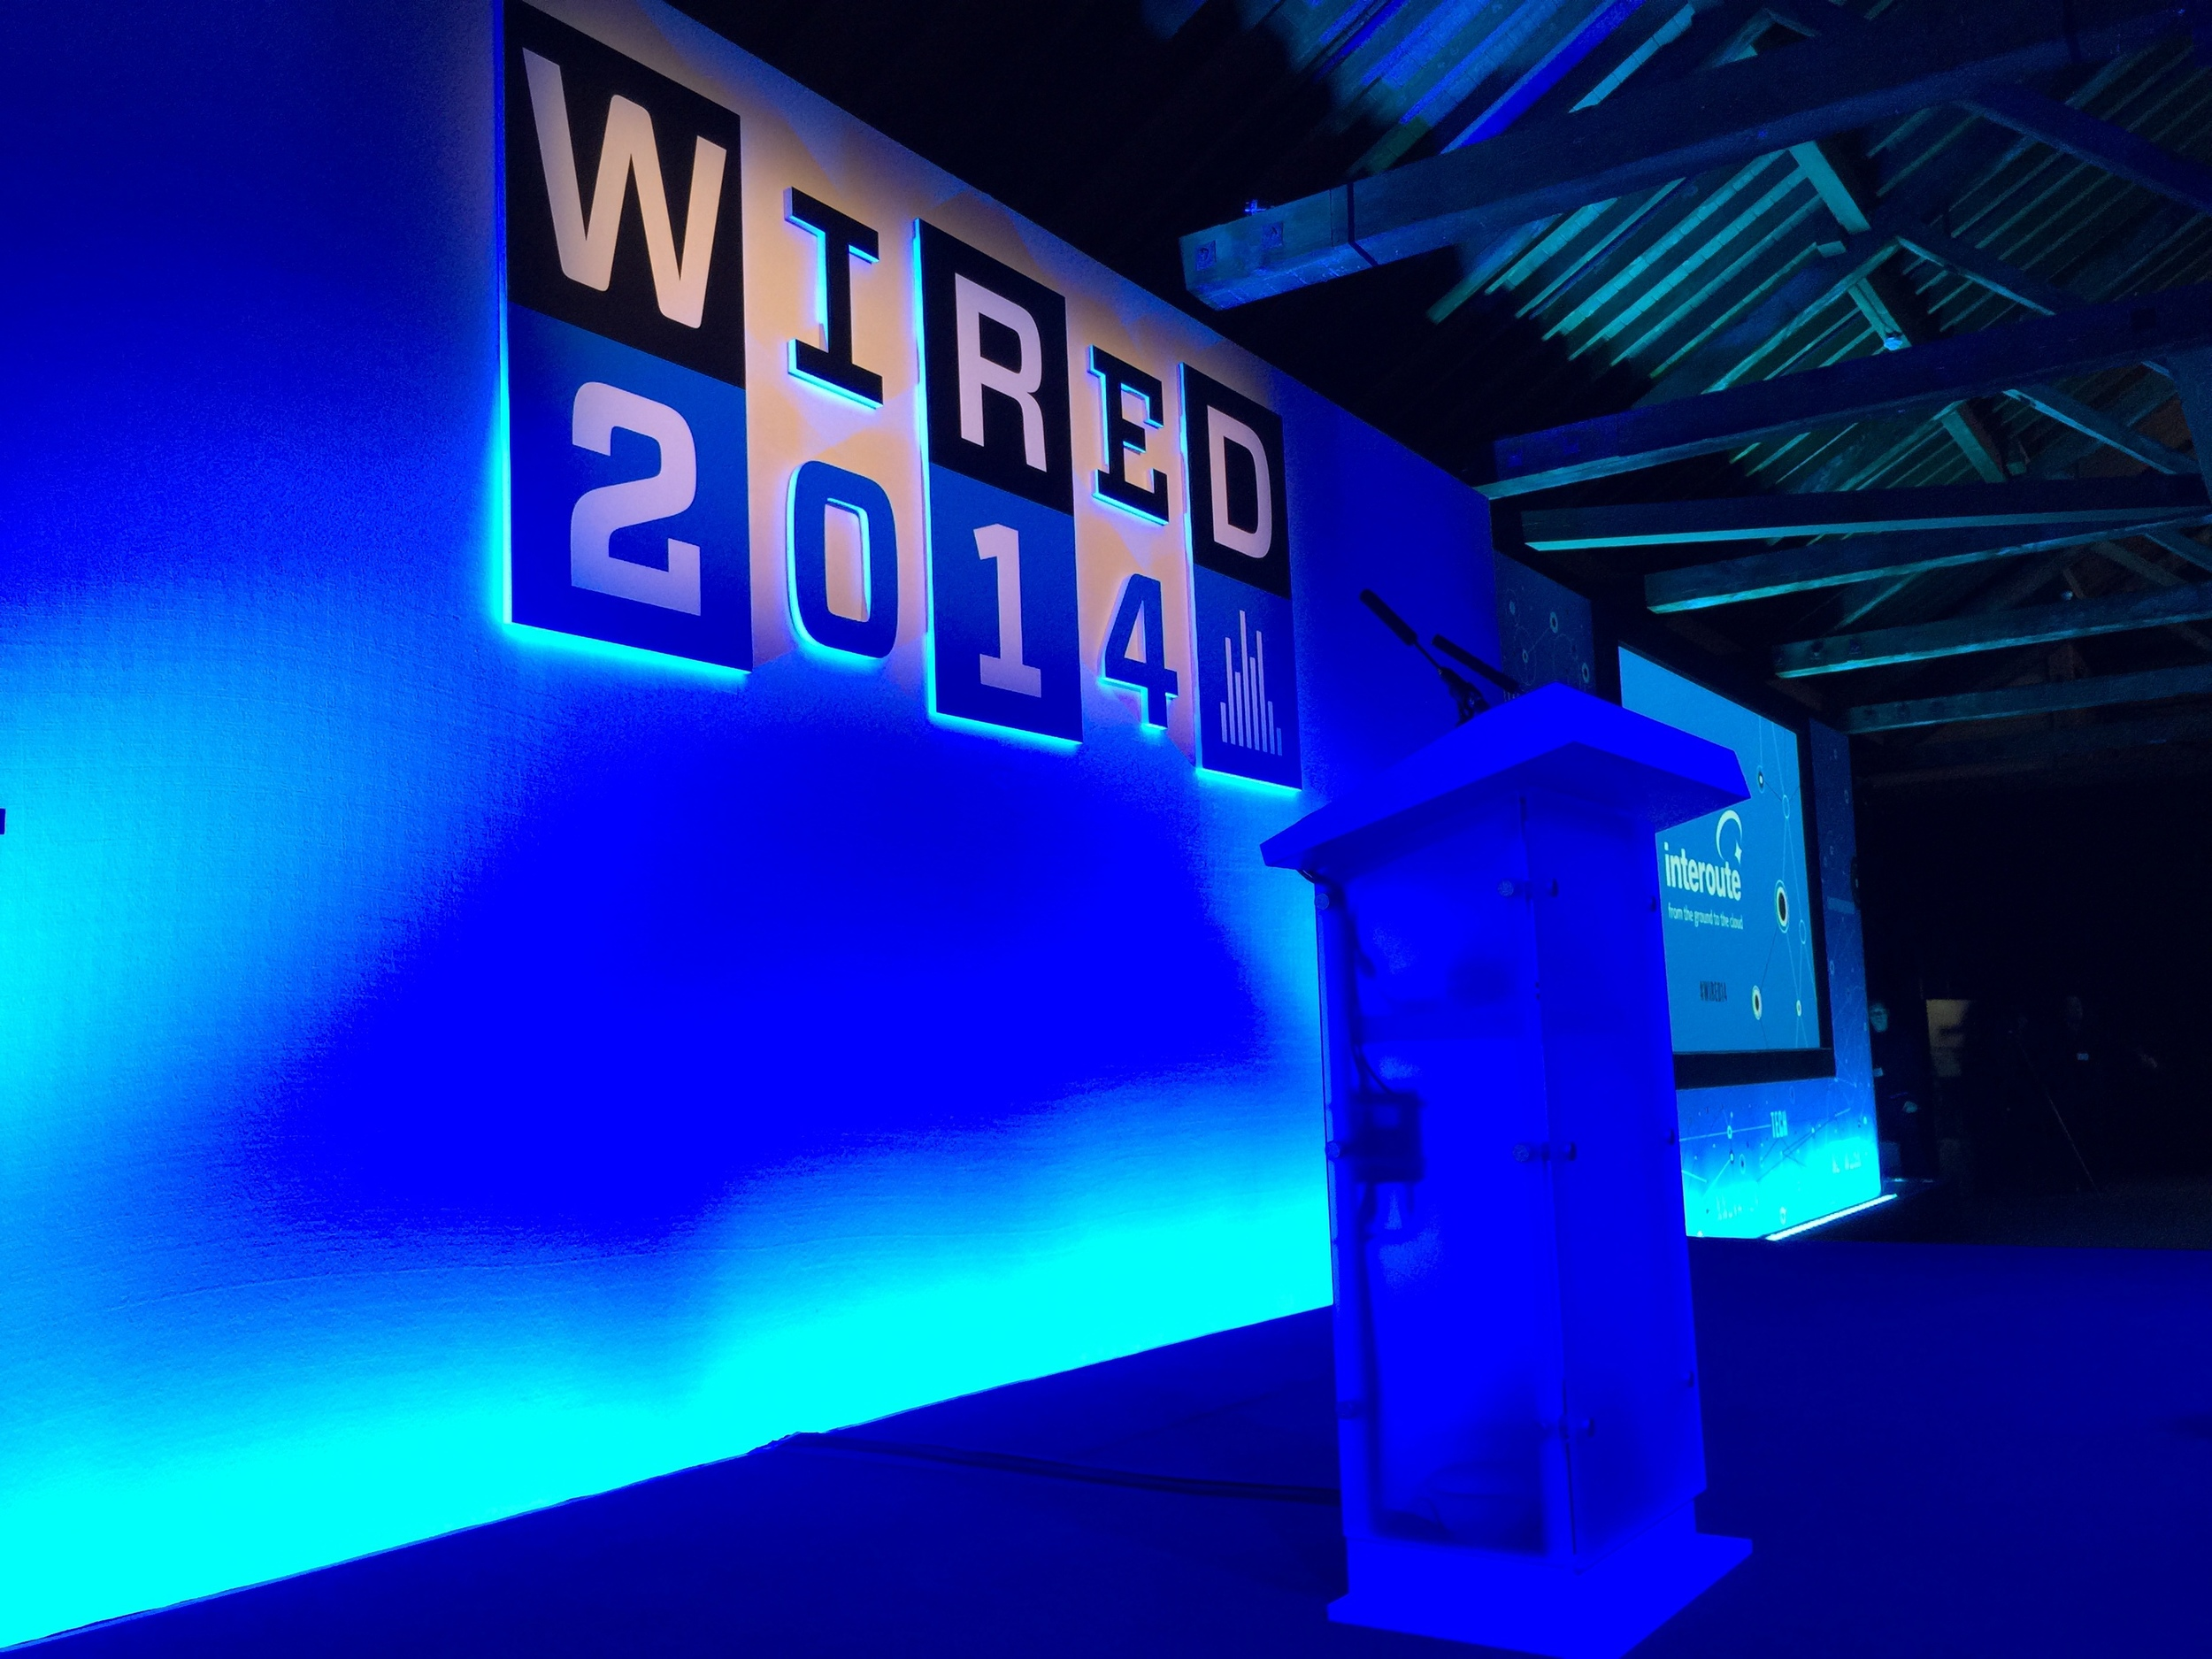 wired2014.jpg